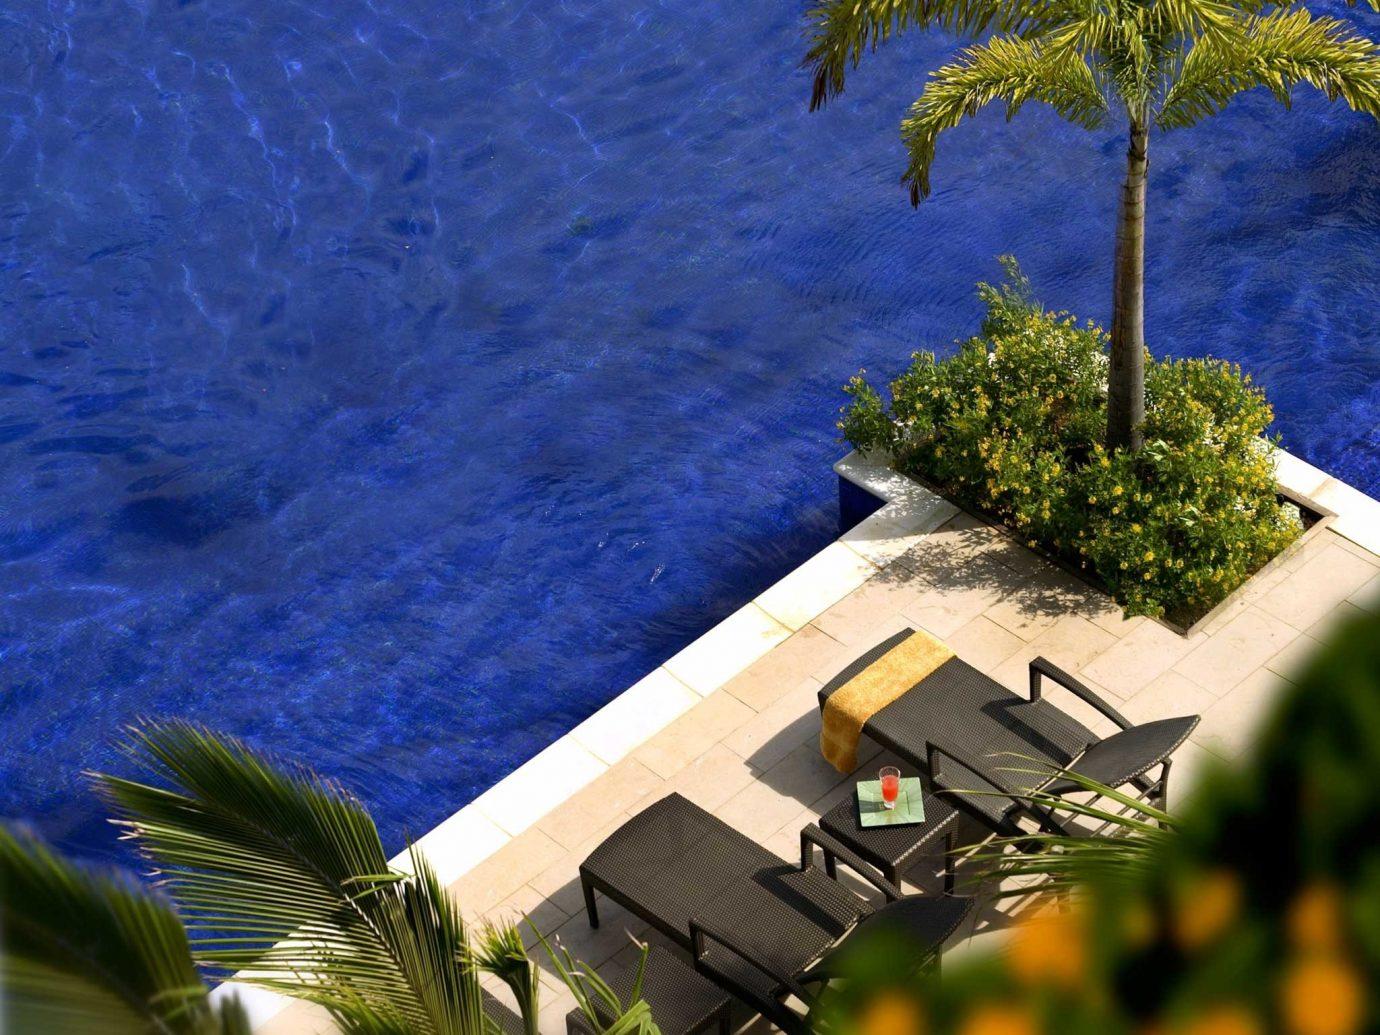 Beach Beachfront Hotels Island Living Romance Wellness tree outdoor grass woody plant arecales plant Coast flower Sea wind